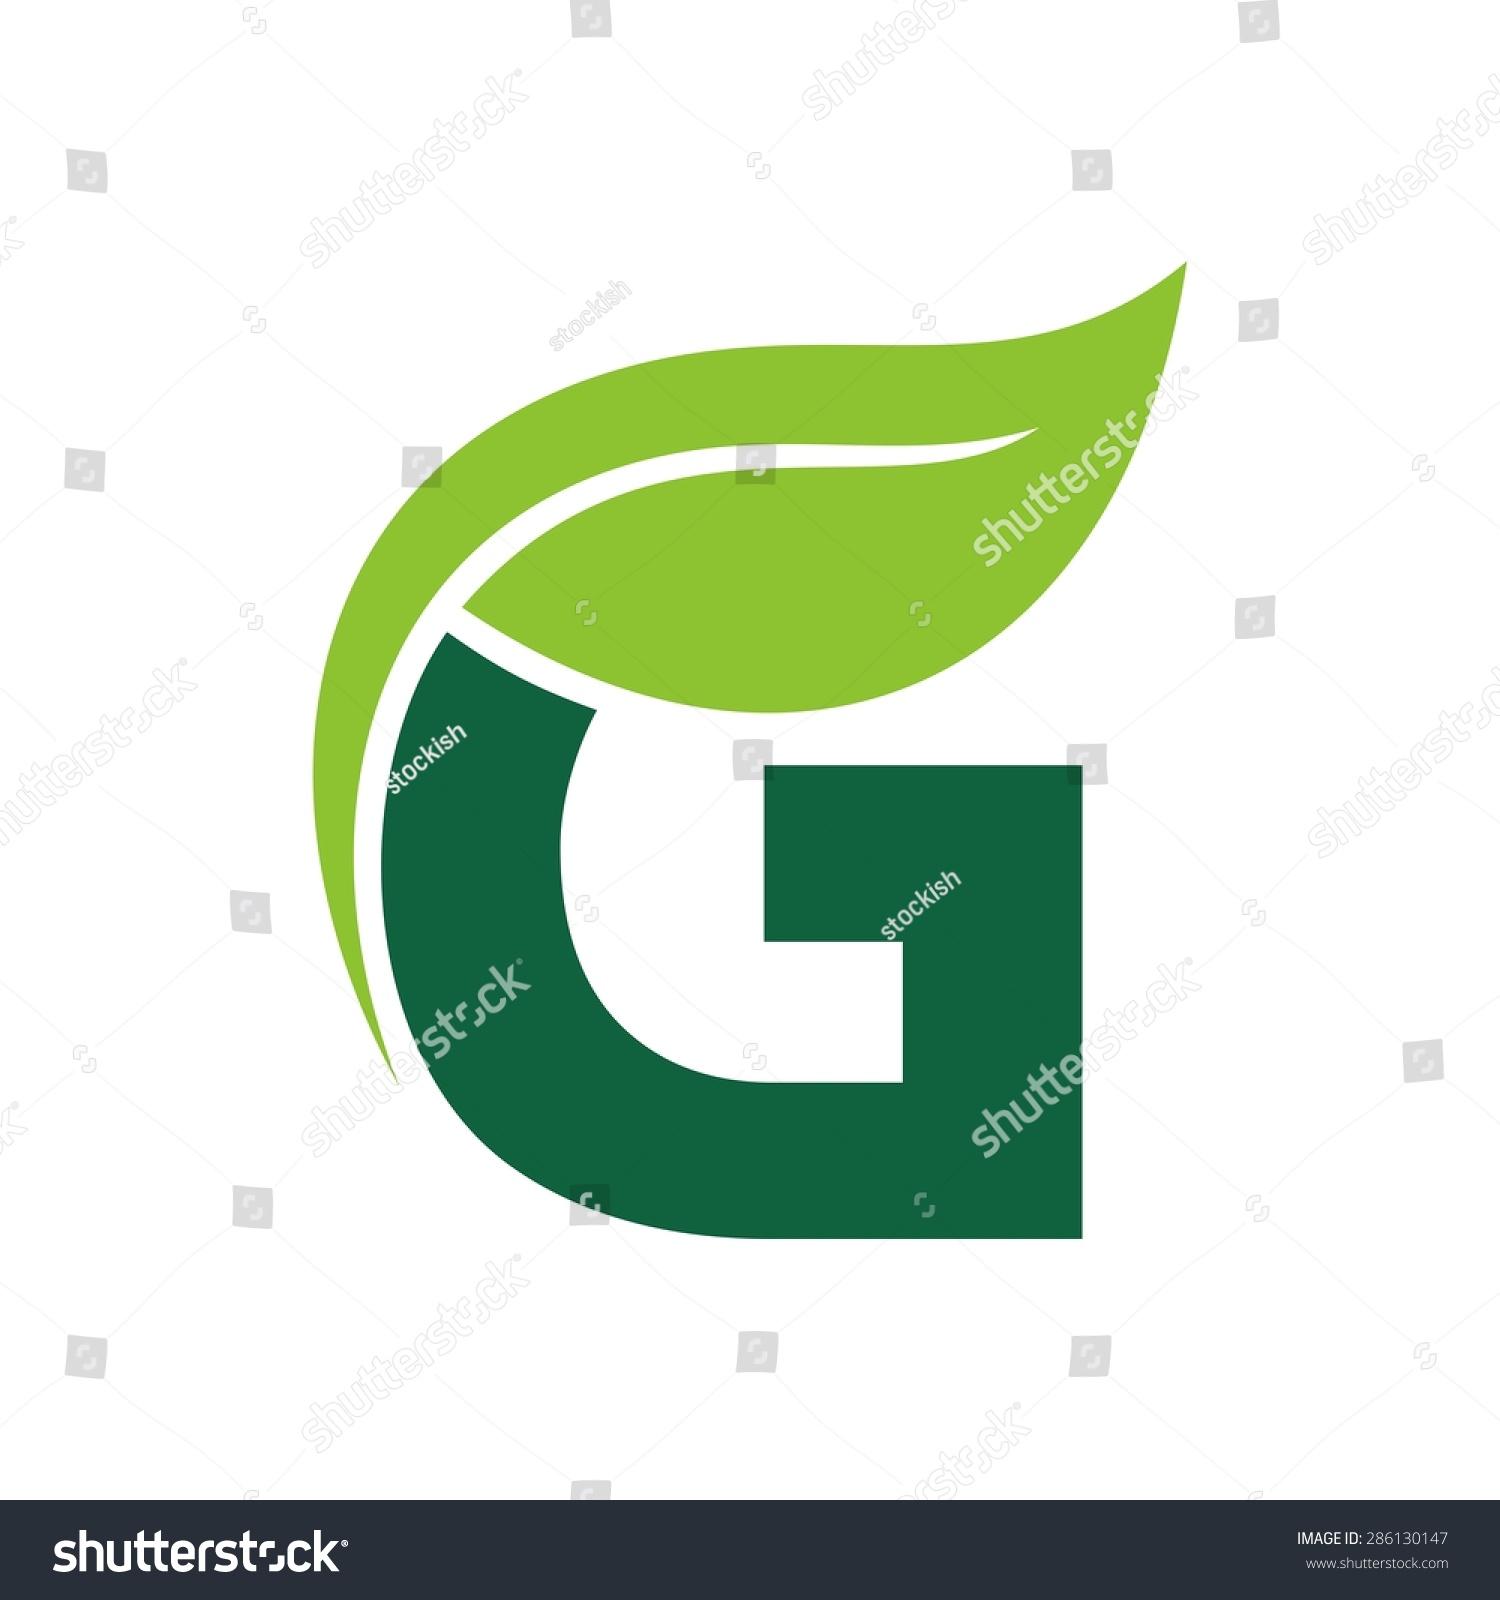 Logo Vector Graphic Elegant Green Possible Stock Vector Royalty